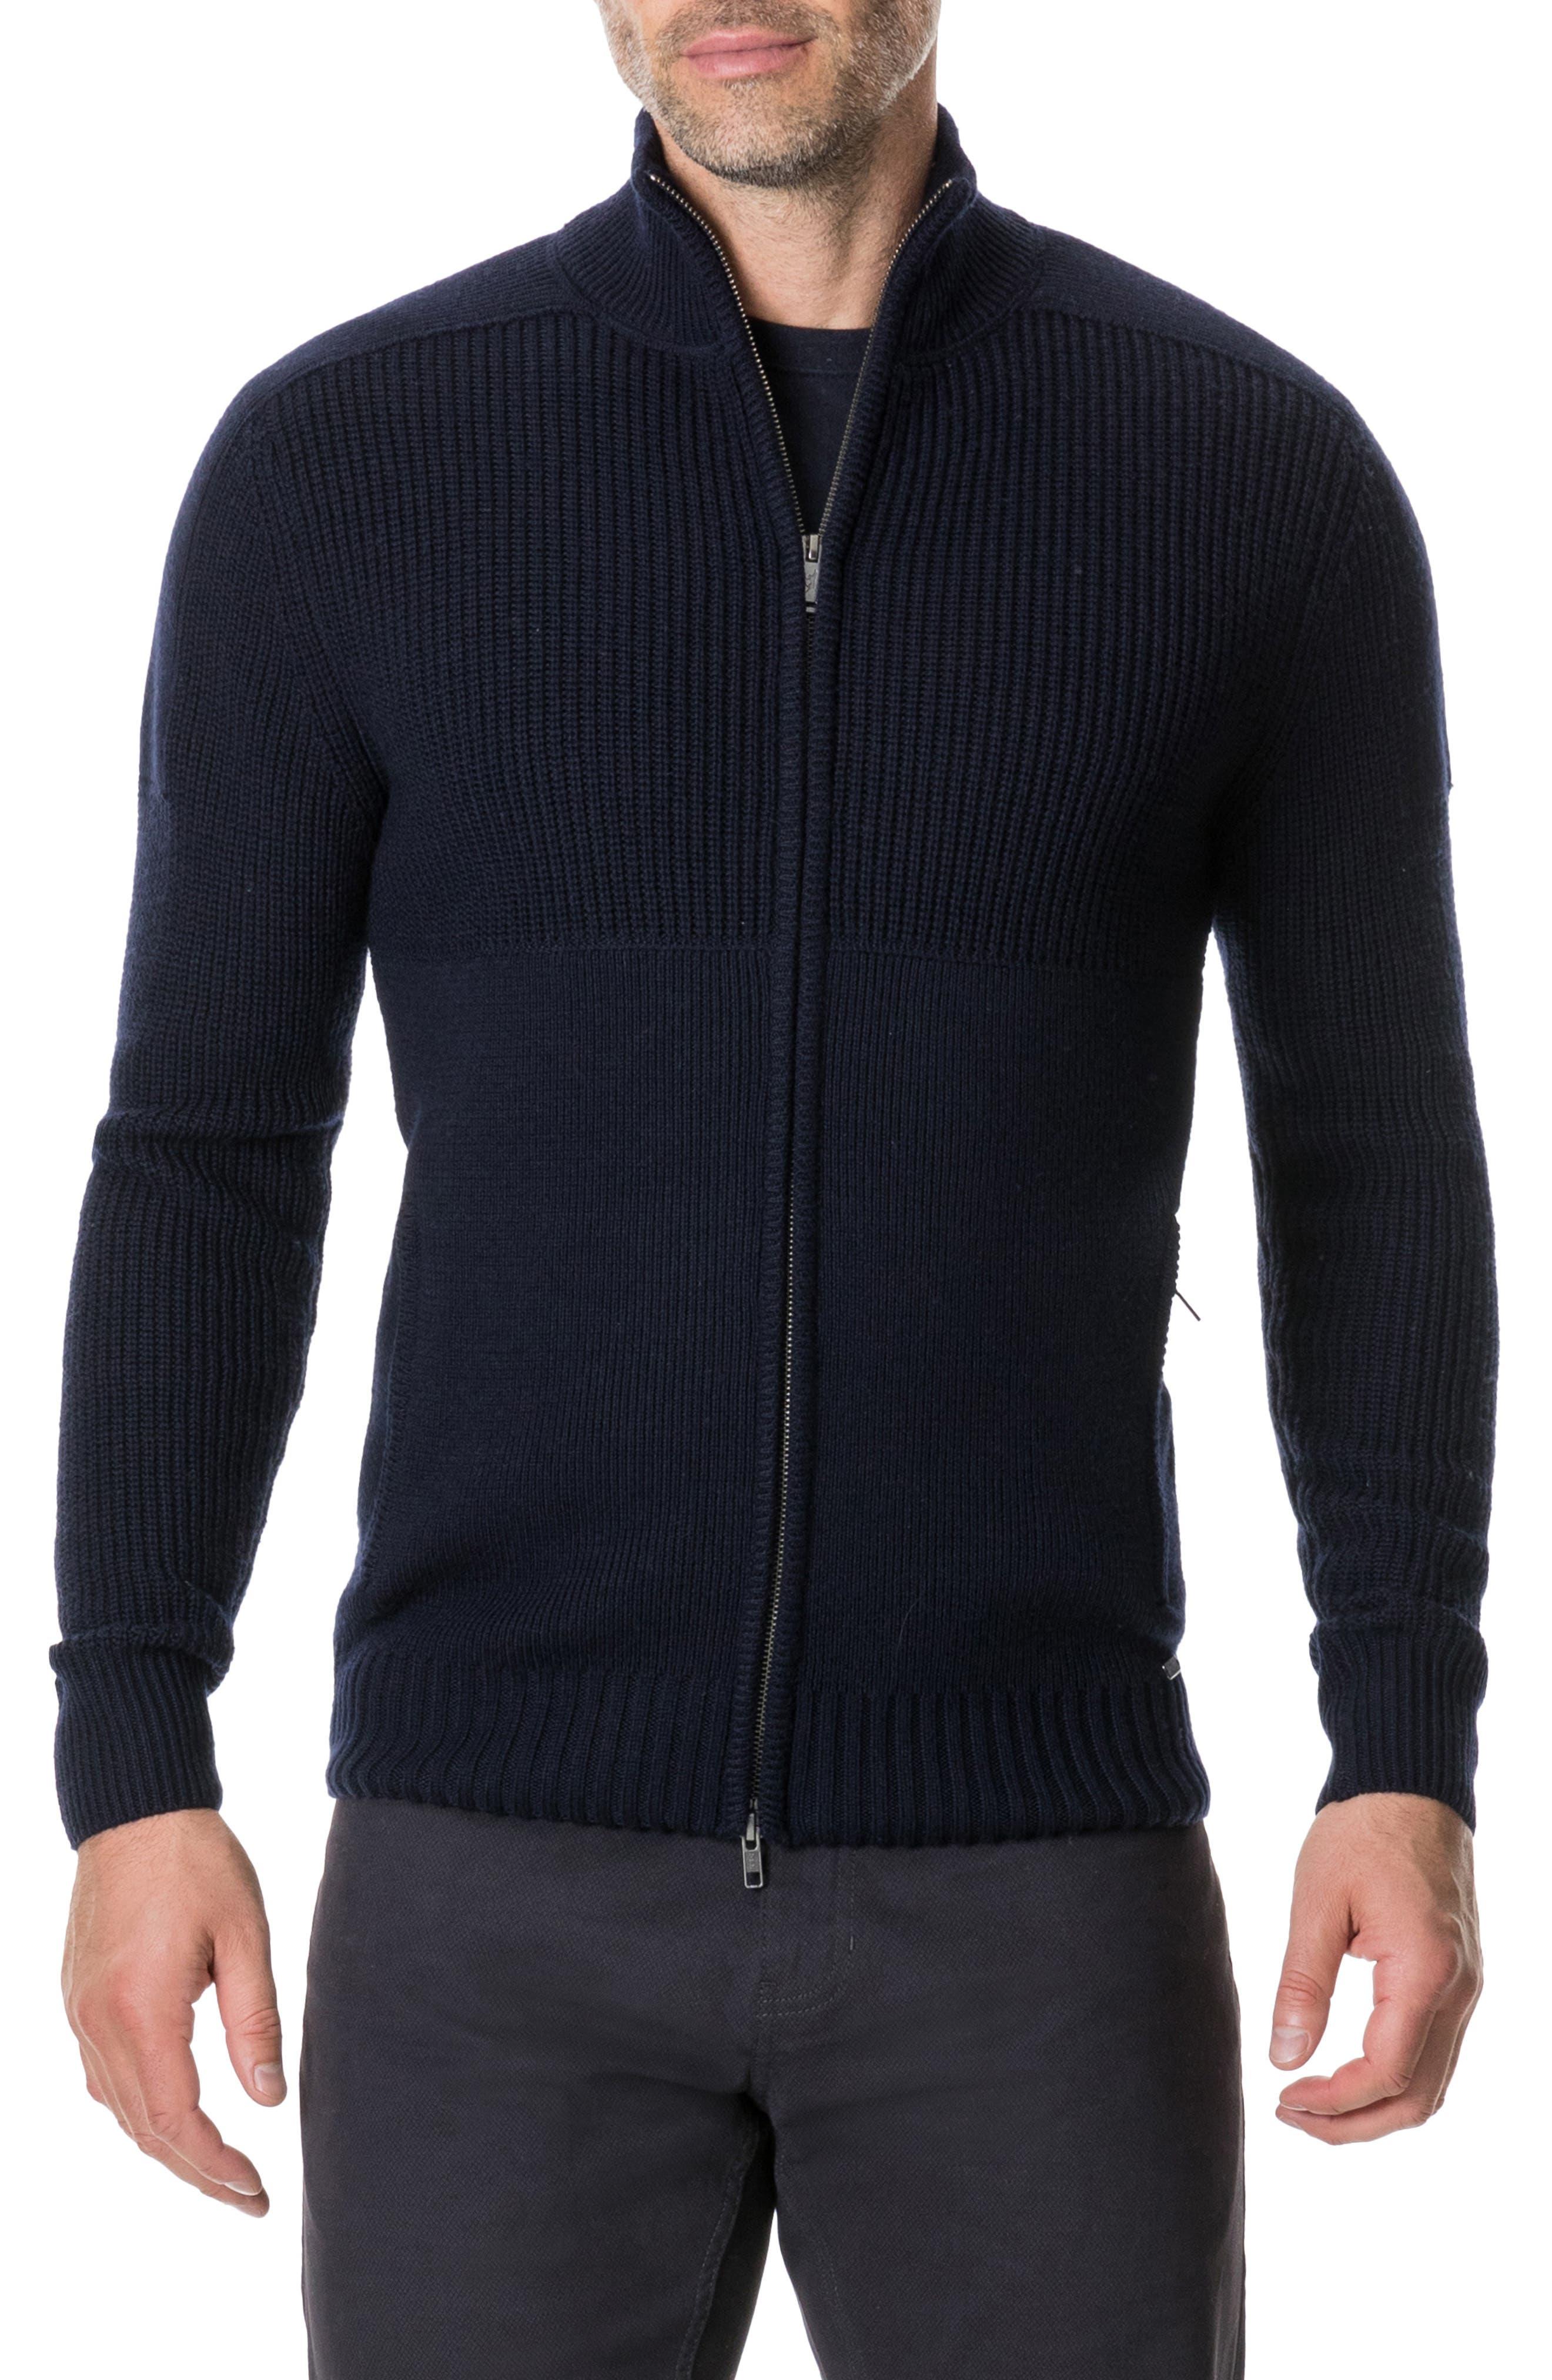 Kina Beach Merino Wool Zip Sweater,                             Main thumbnail 1, color,                             400